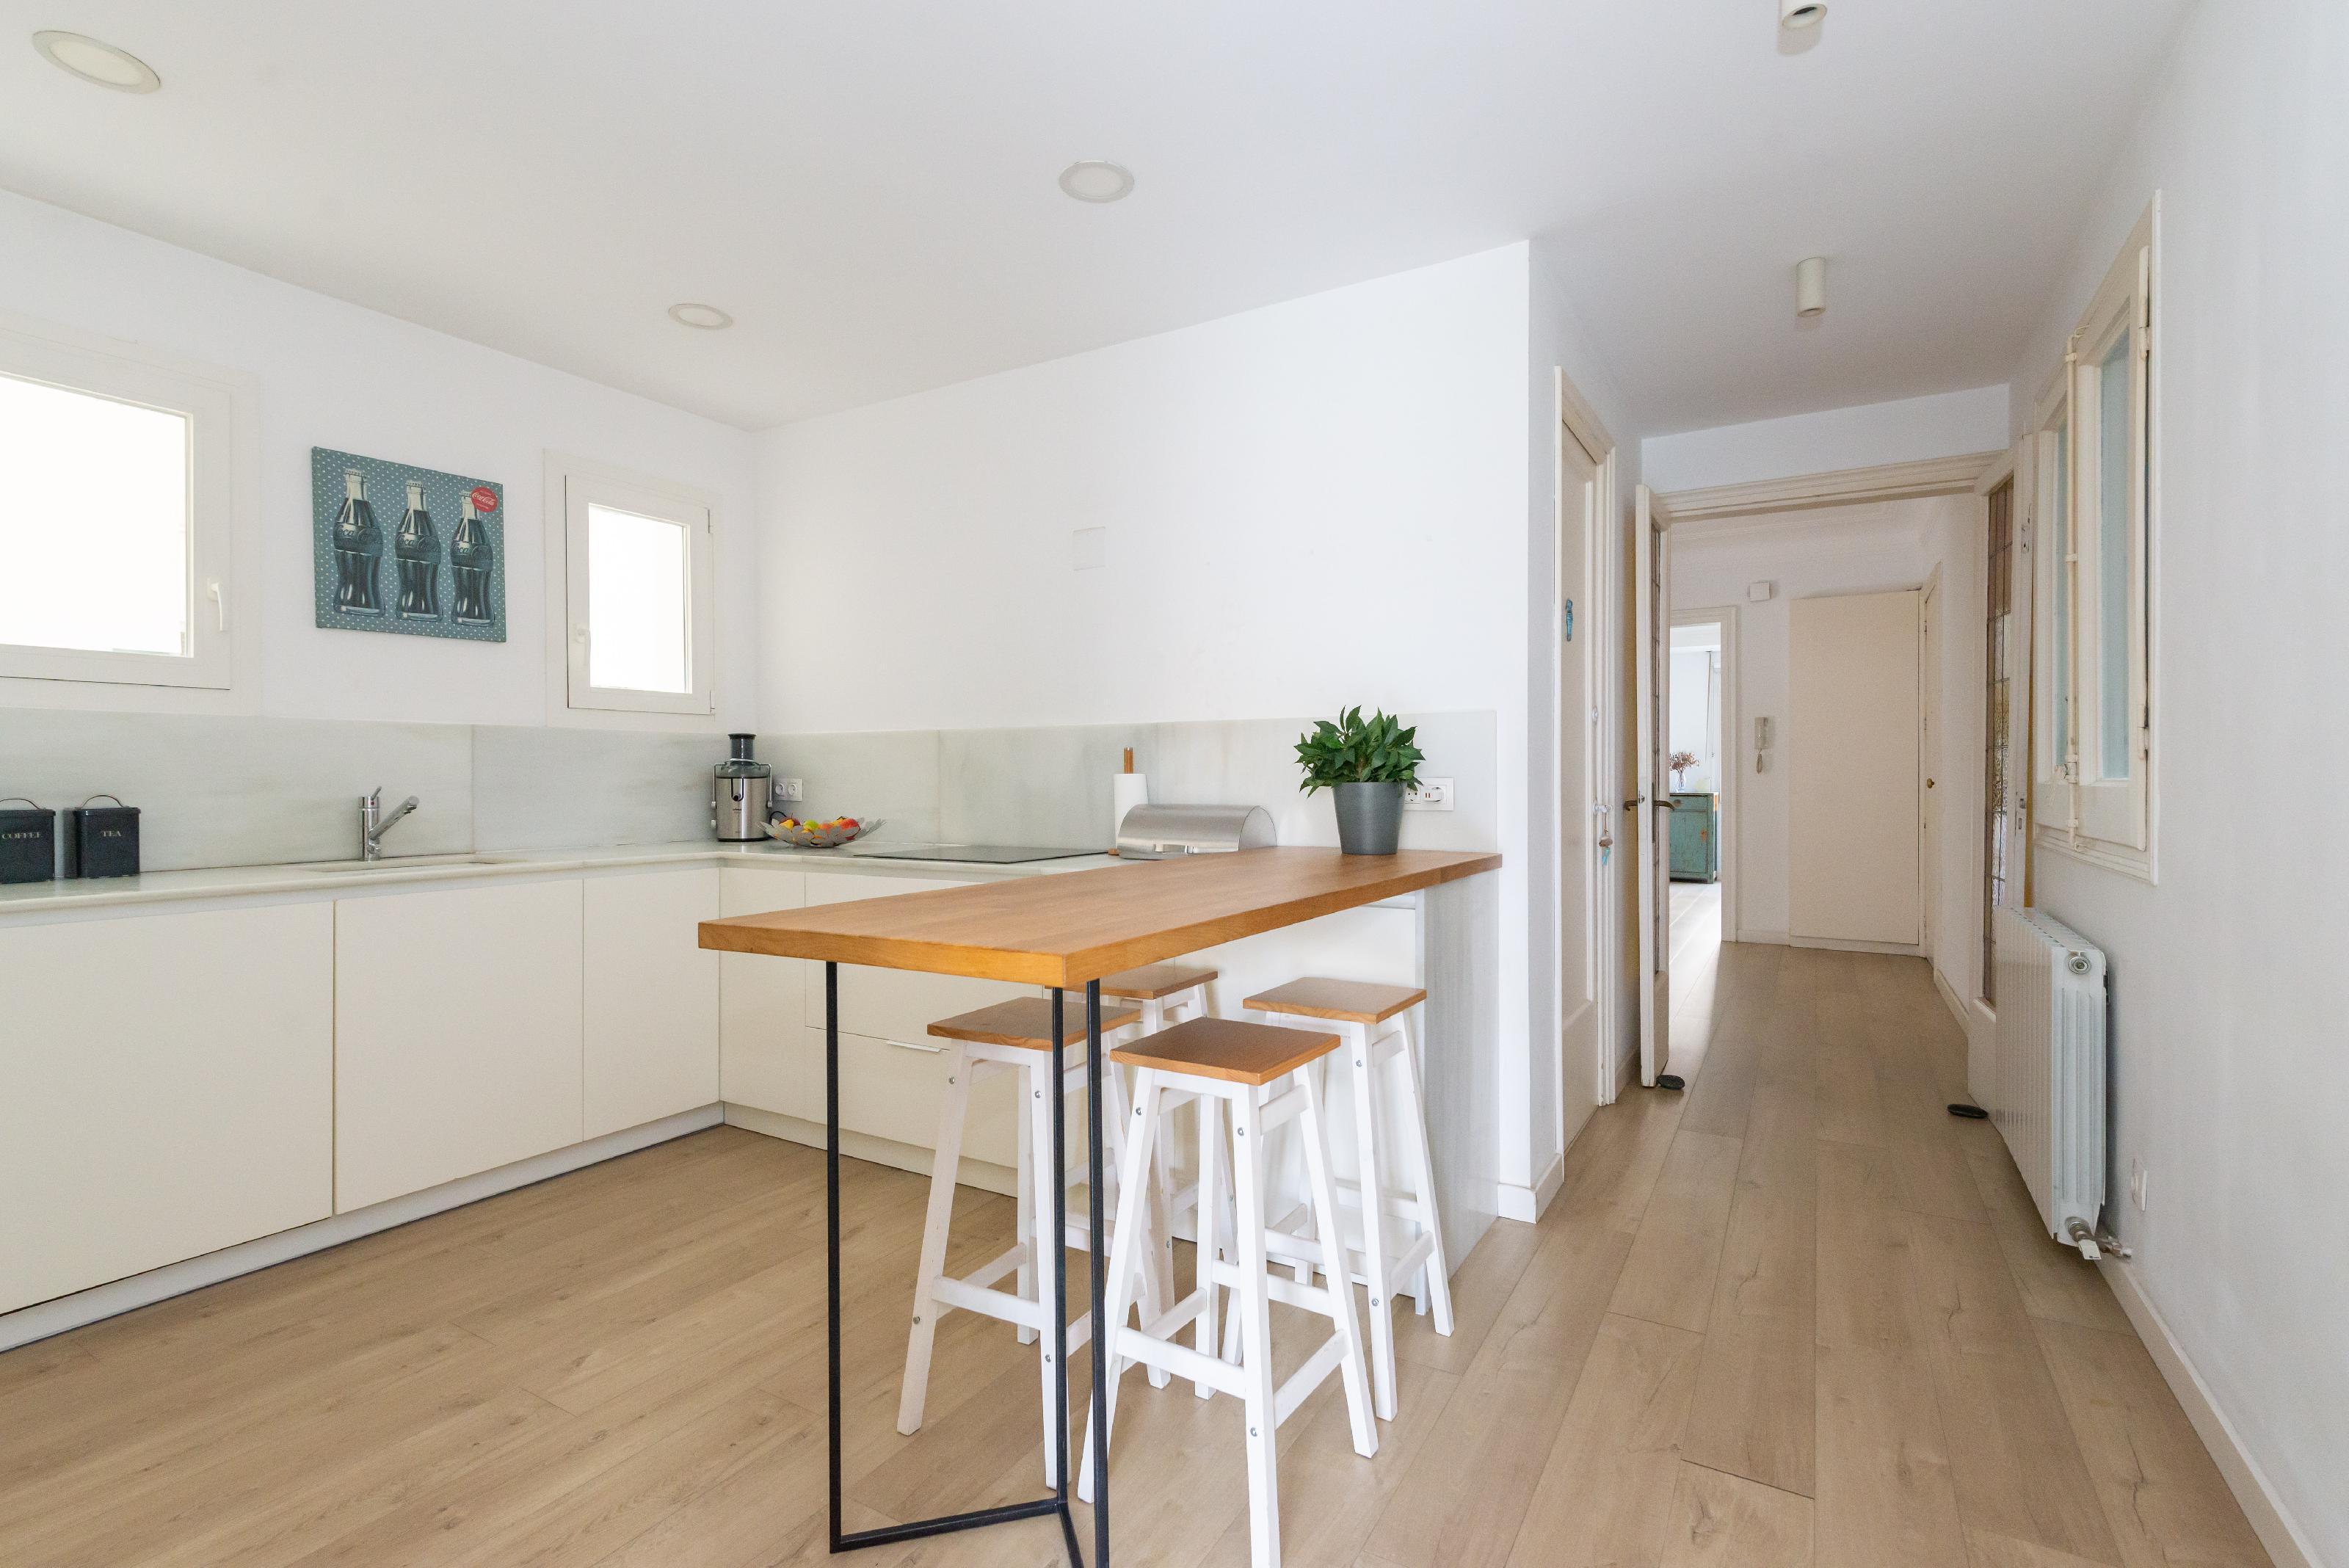 250005 Flat for sale in Sarrià-Sant Gervasi, Sant Gervasi-Galvany 19